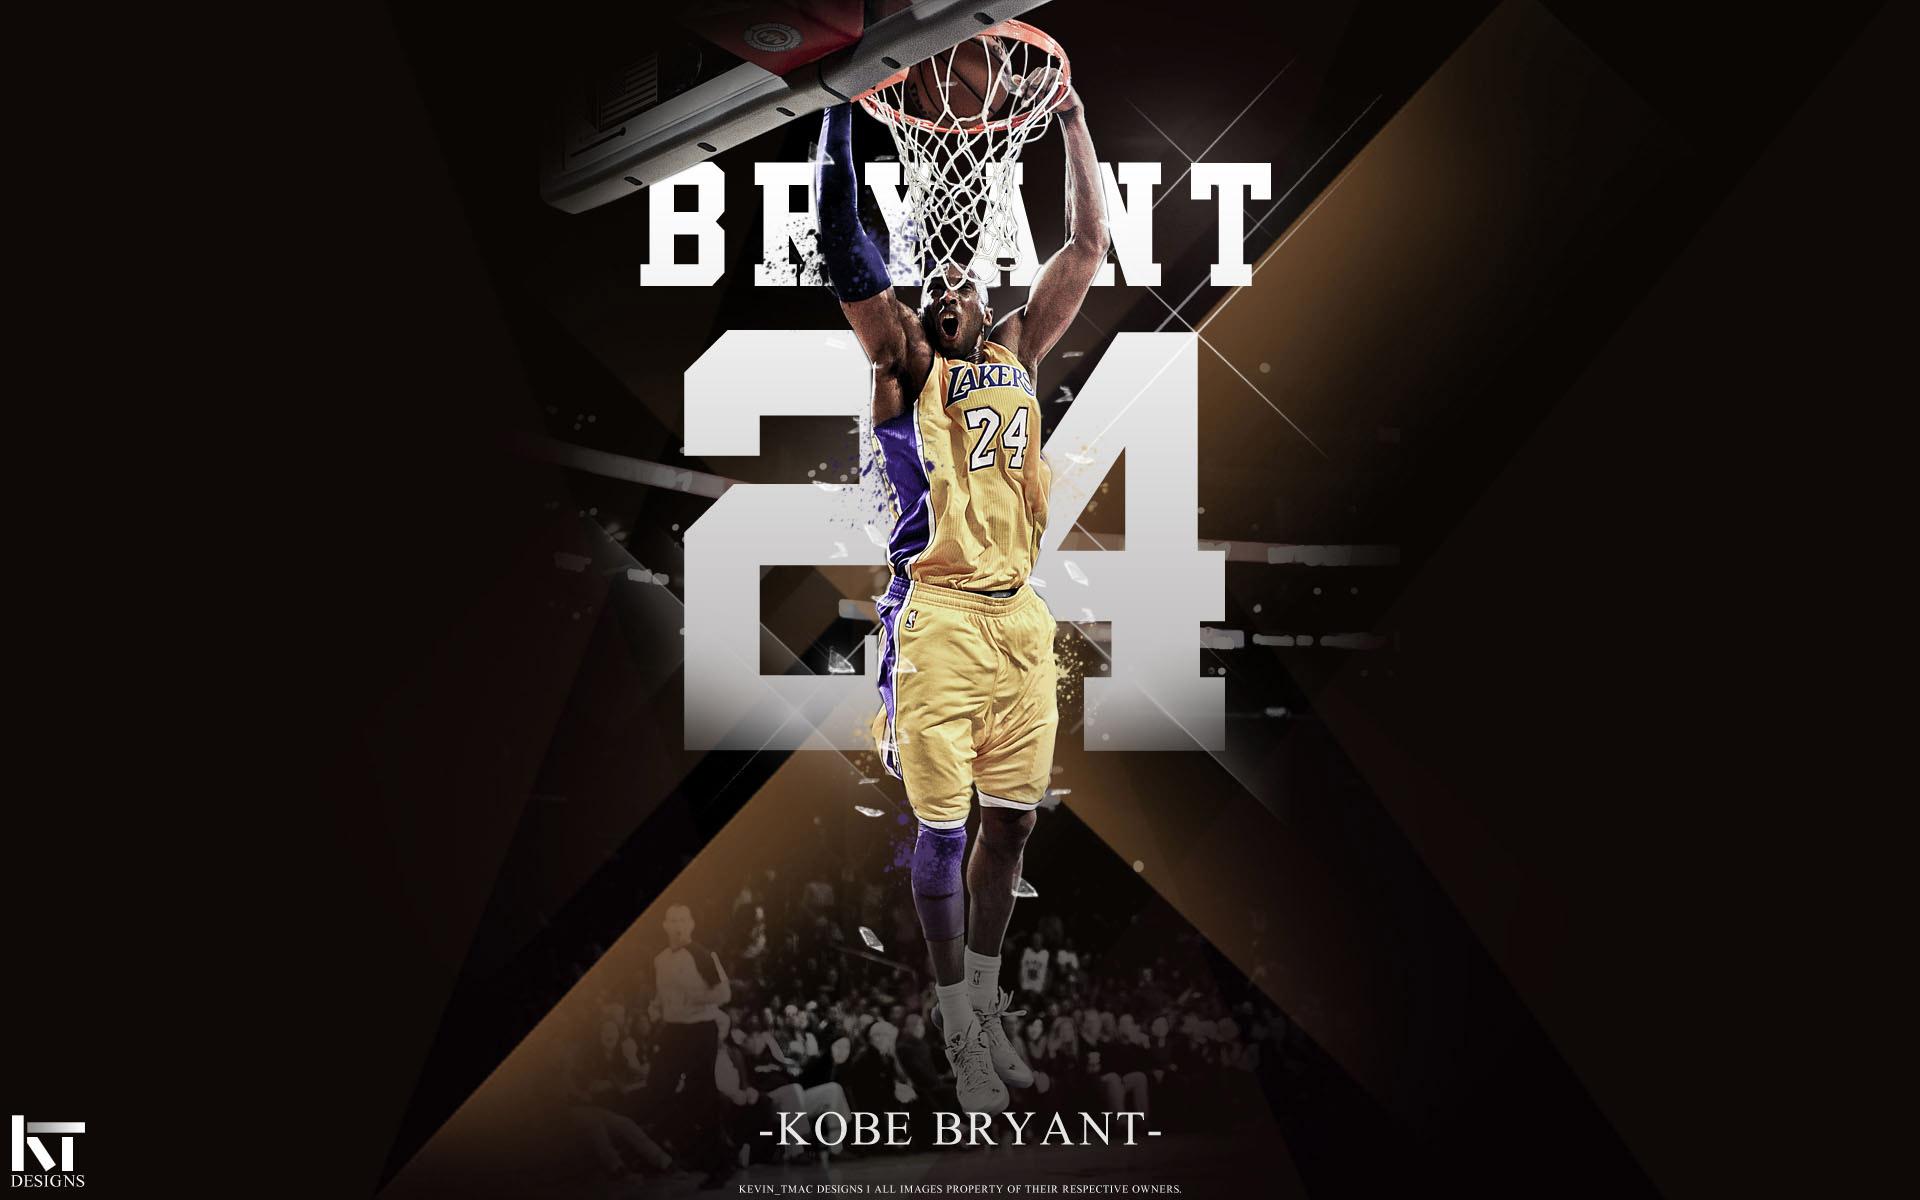 Wallpapers   Kobe Bryant Lakers Dunk 1920x1200 wallpaper 1920x1200